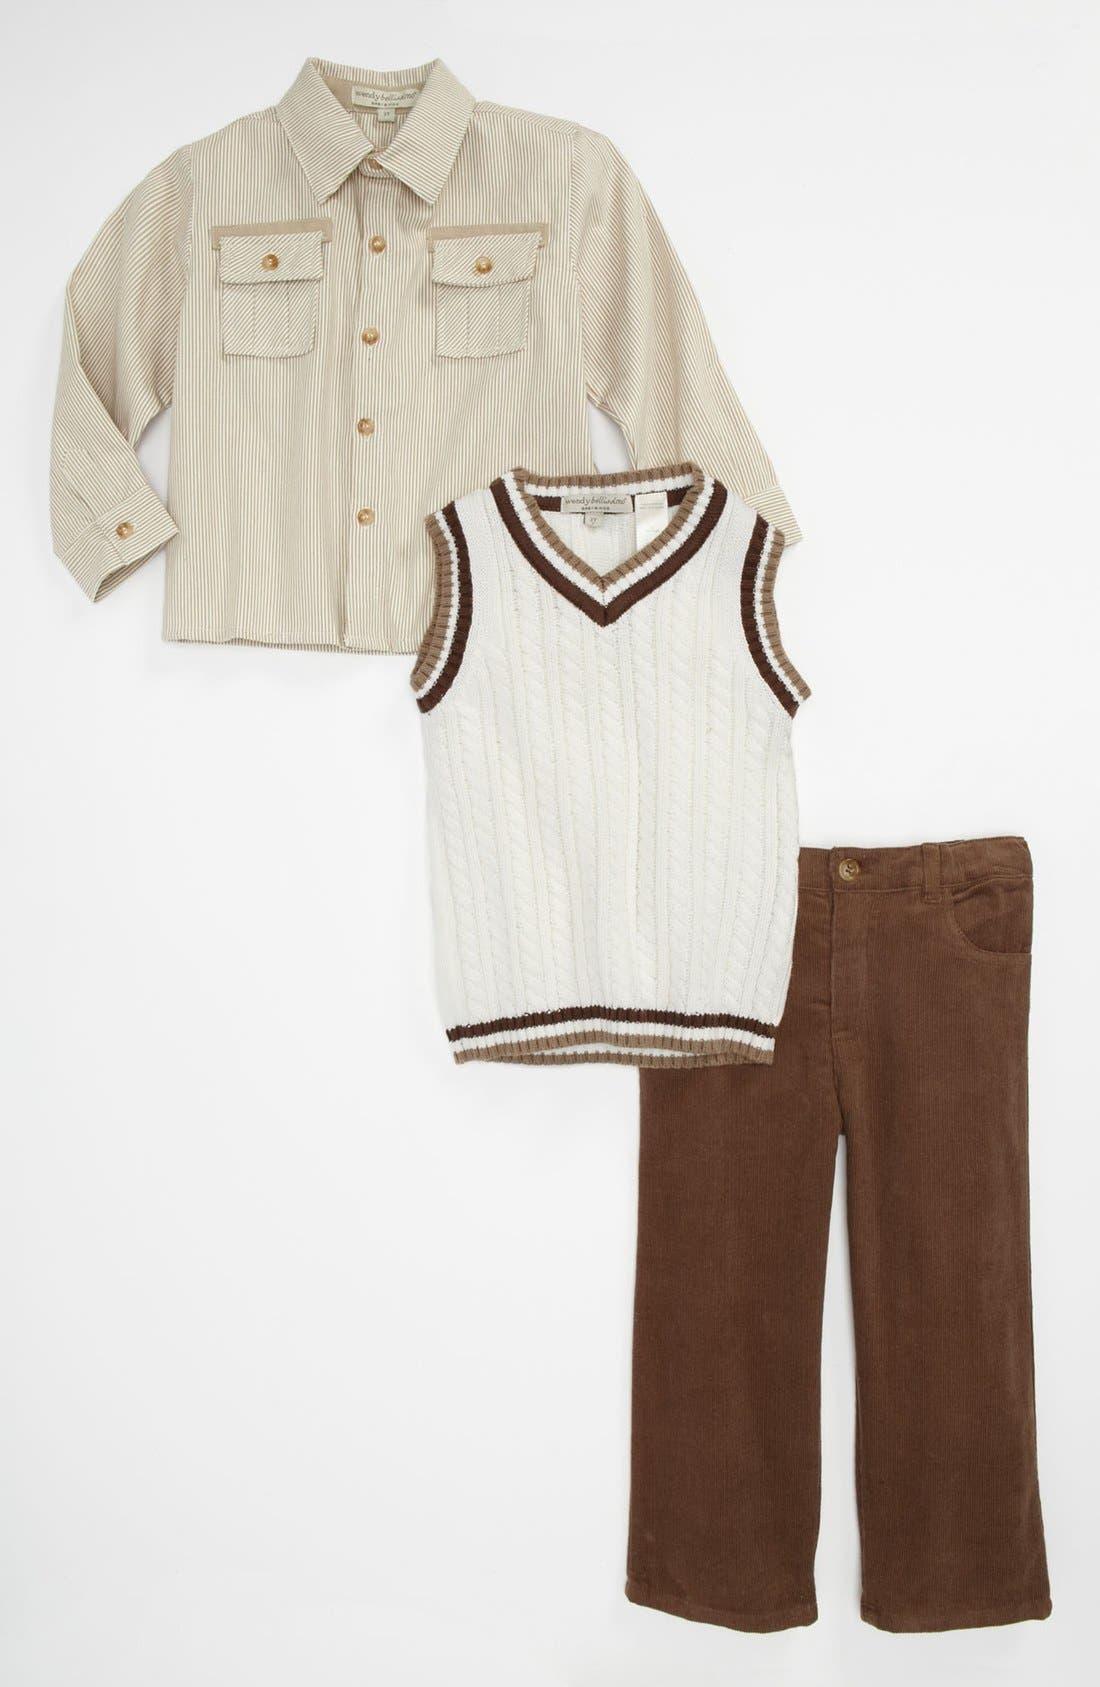 Main Image - Wendy Bellisimo Sweater Vest, Shirt & Pants (Toddler)